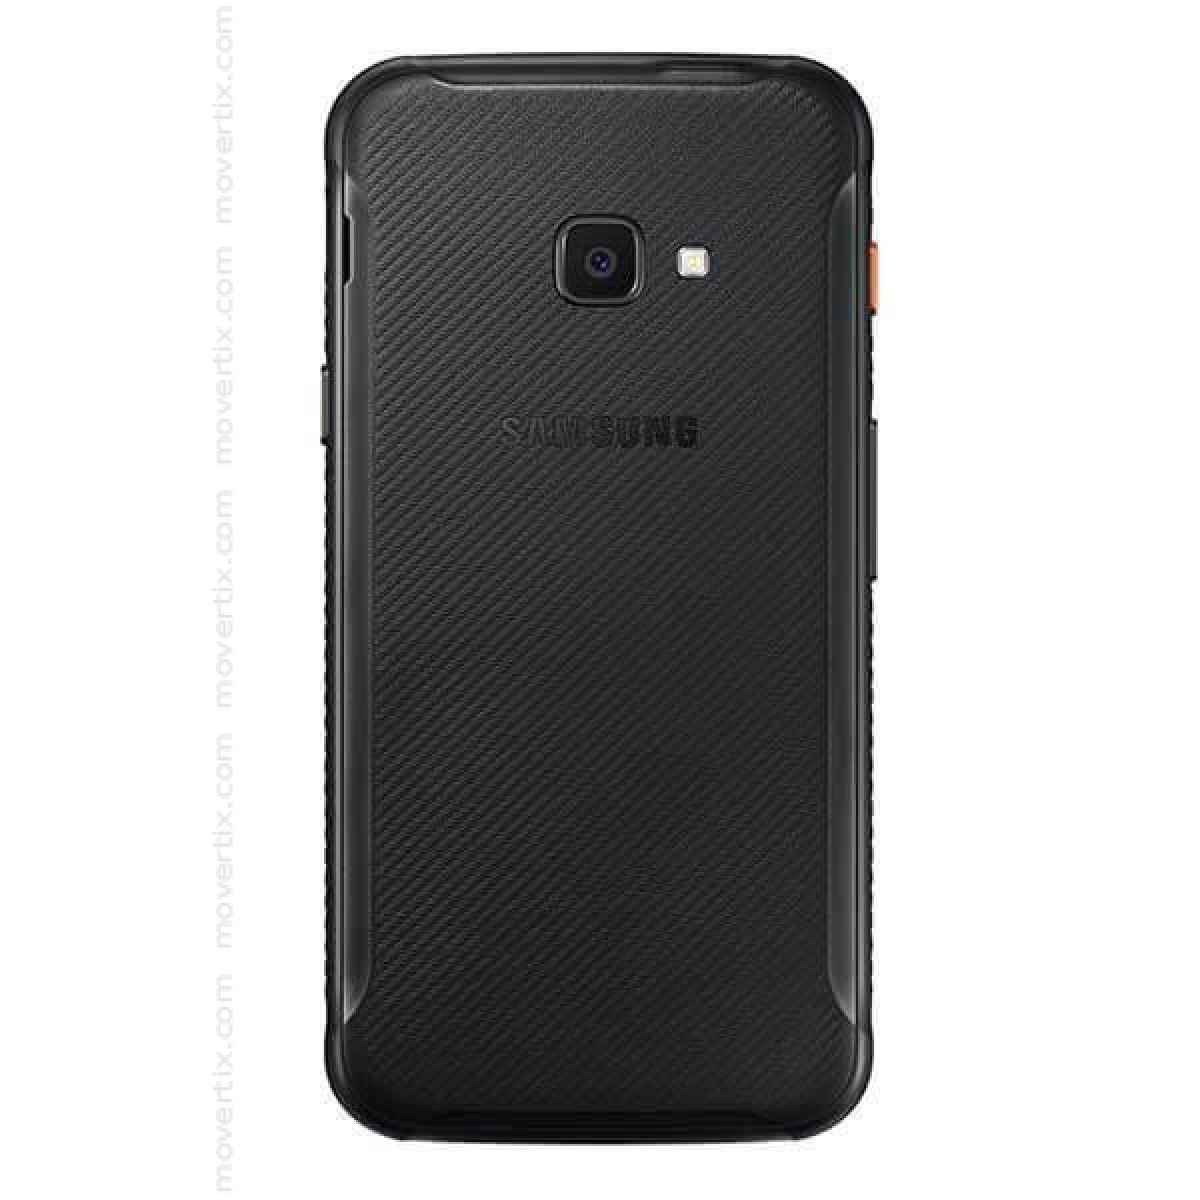 timeless design 82f69 88cf2 Samsung Galaxy Xcover 4s Dual SIM Black (SM-G398F/DS)